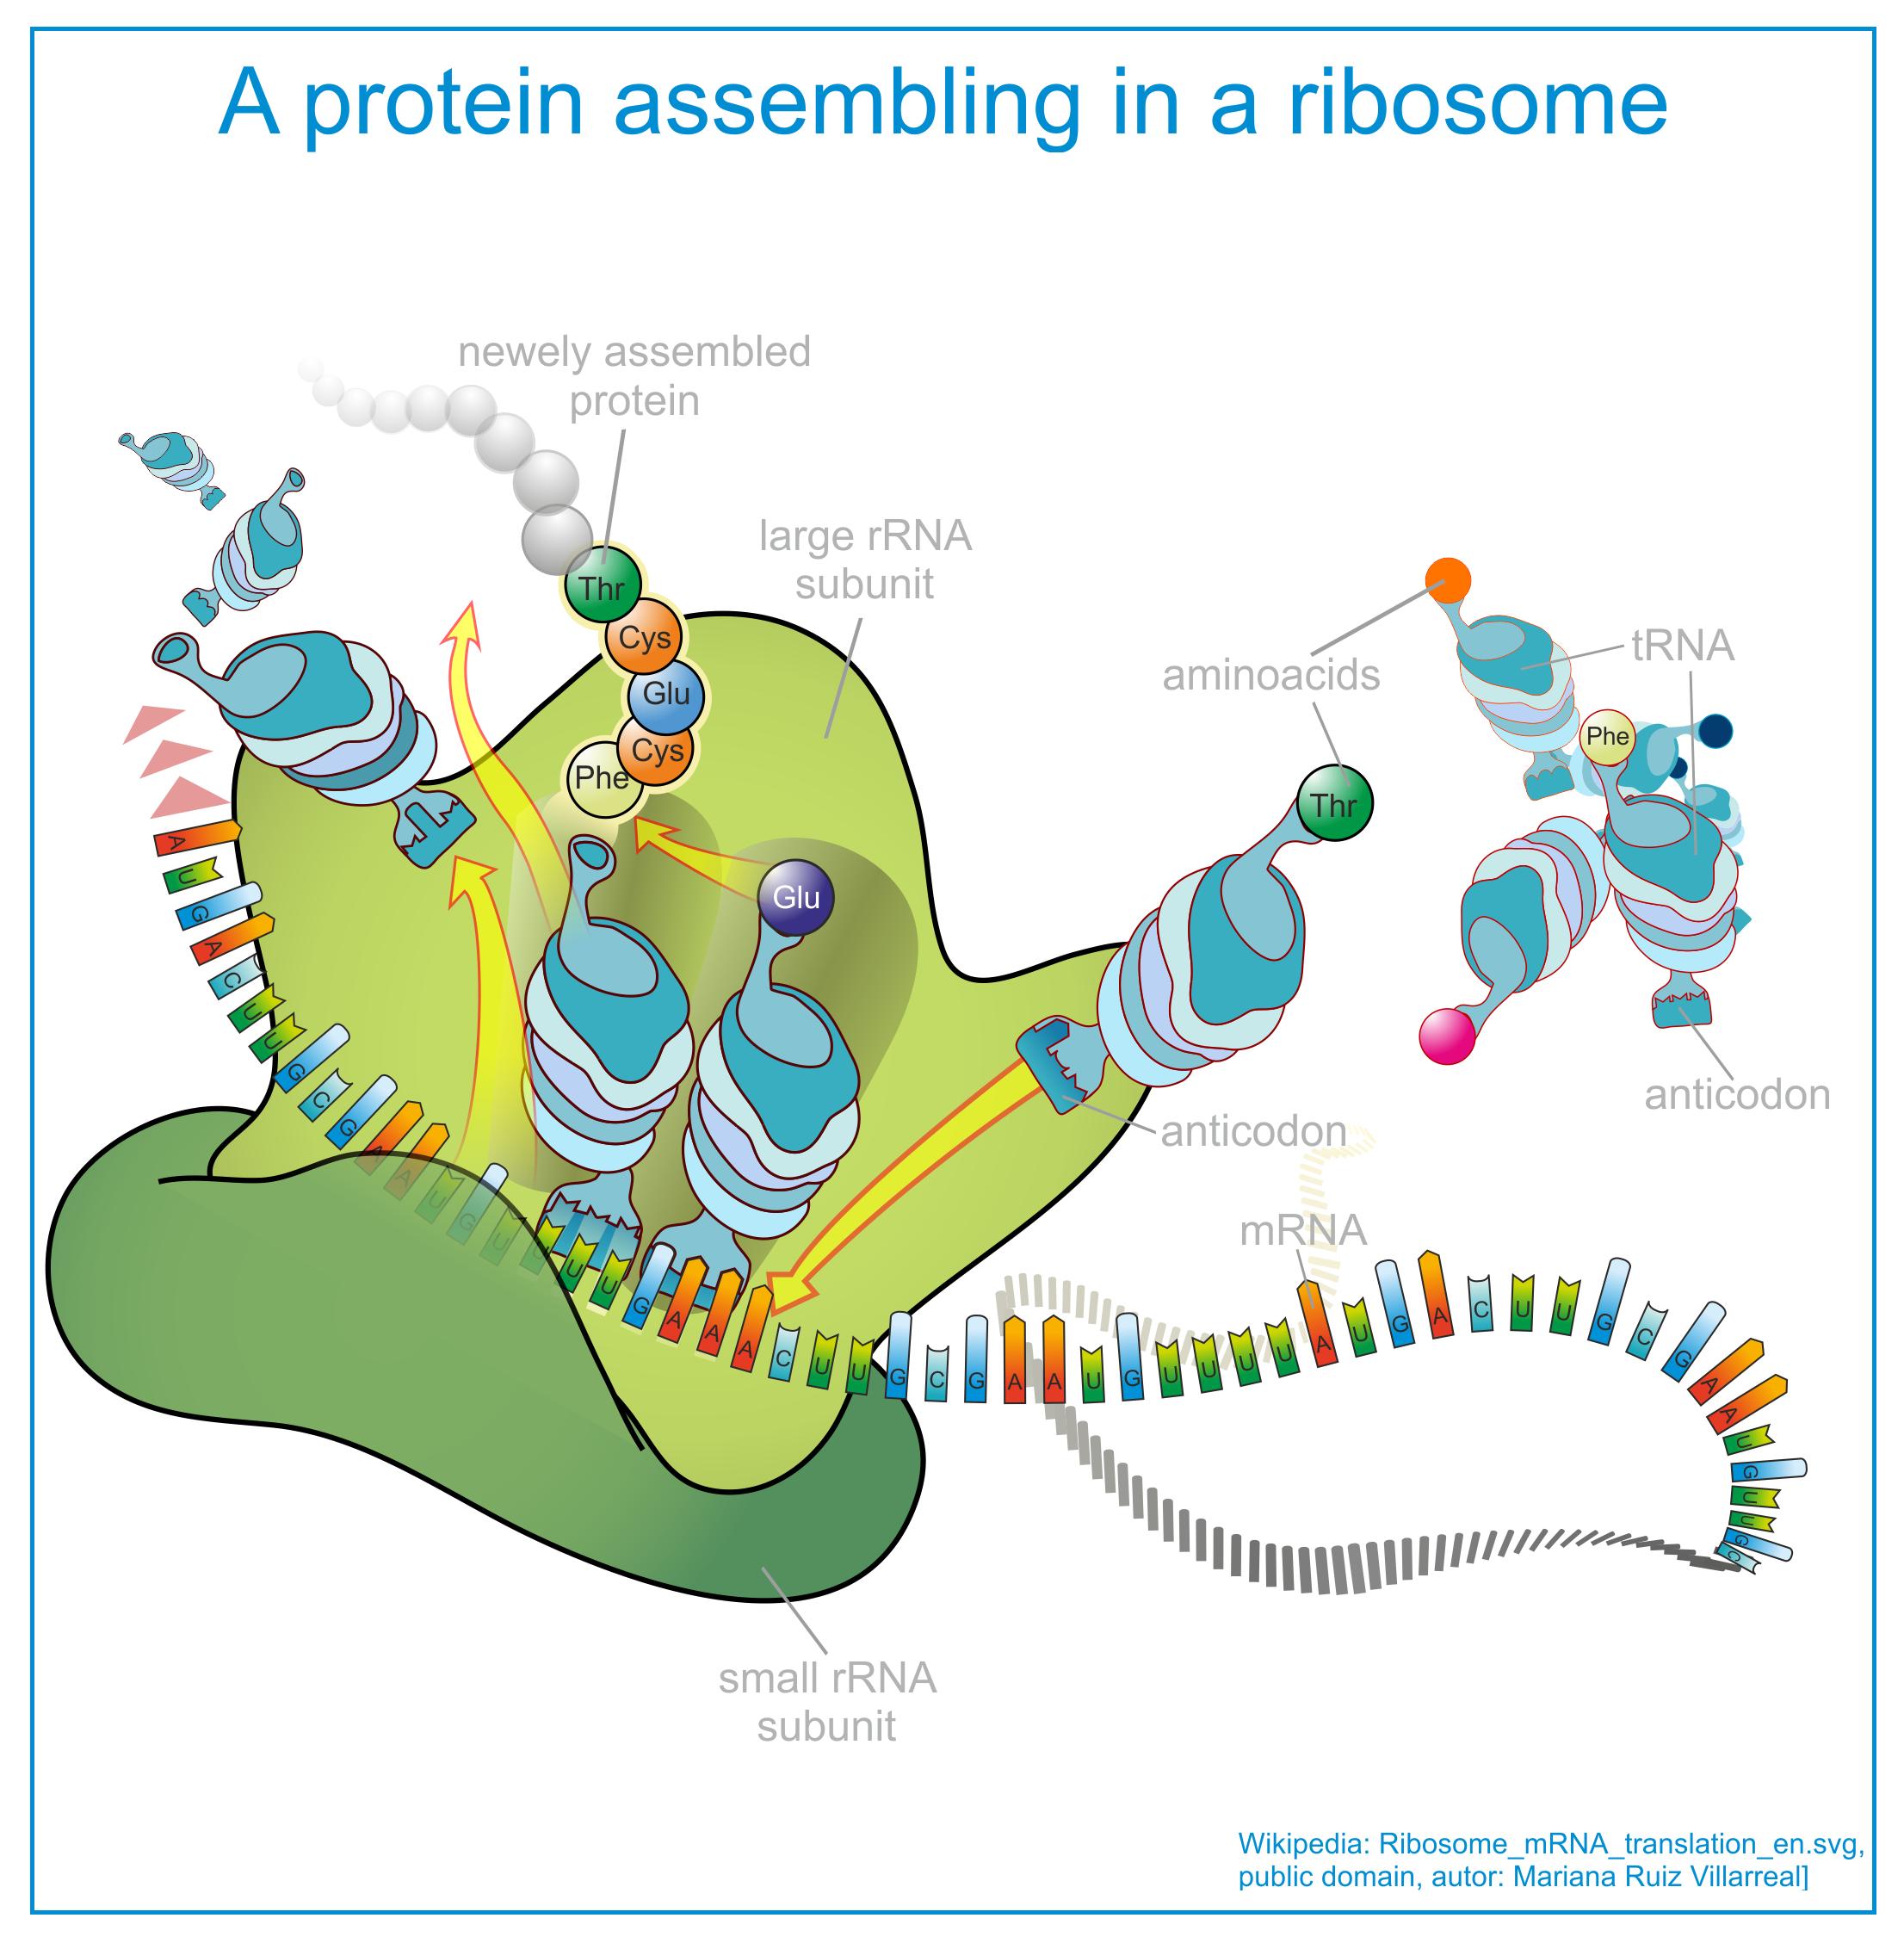 Confirm. dolphin sperm cytoplasmic ribosomes sorry, not